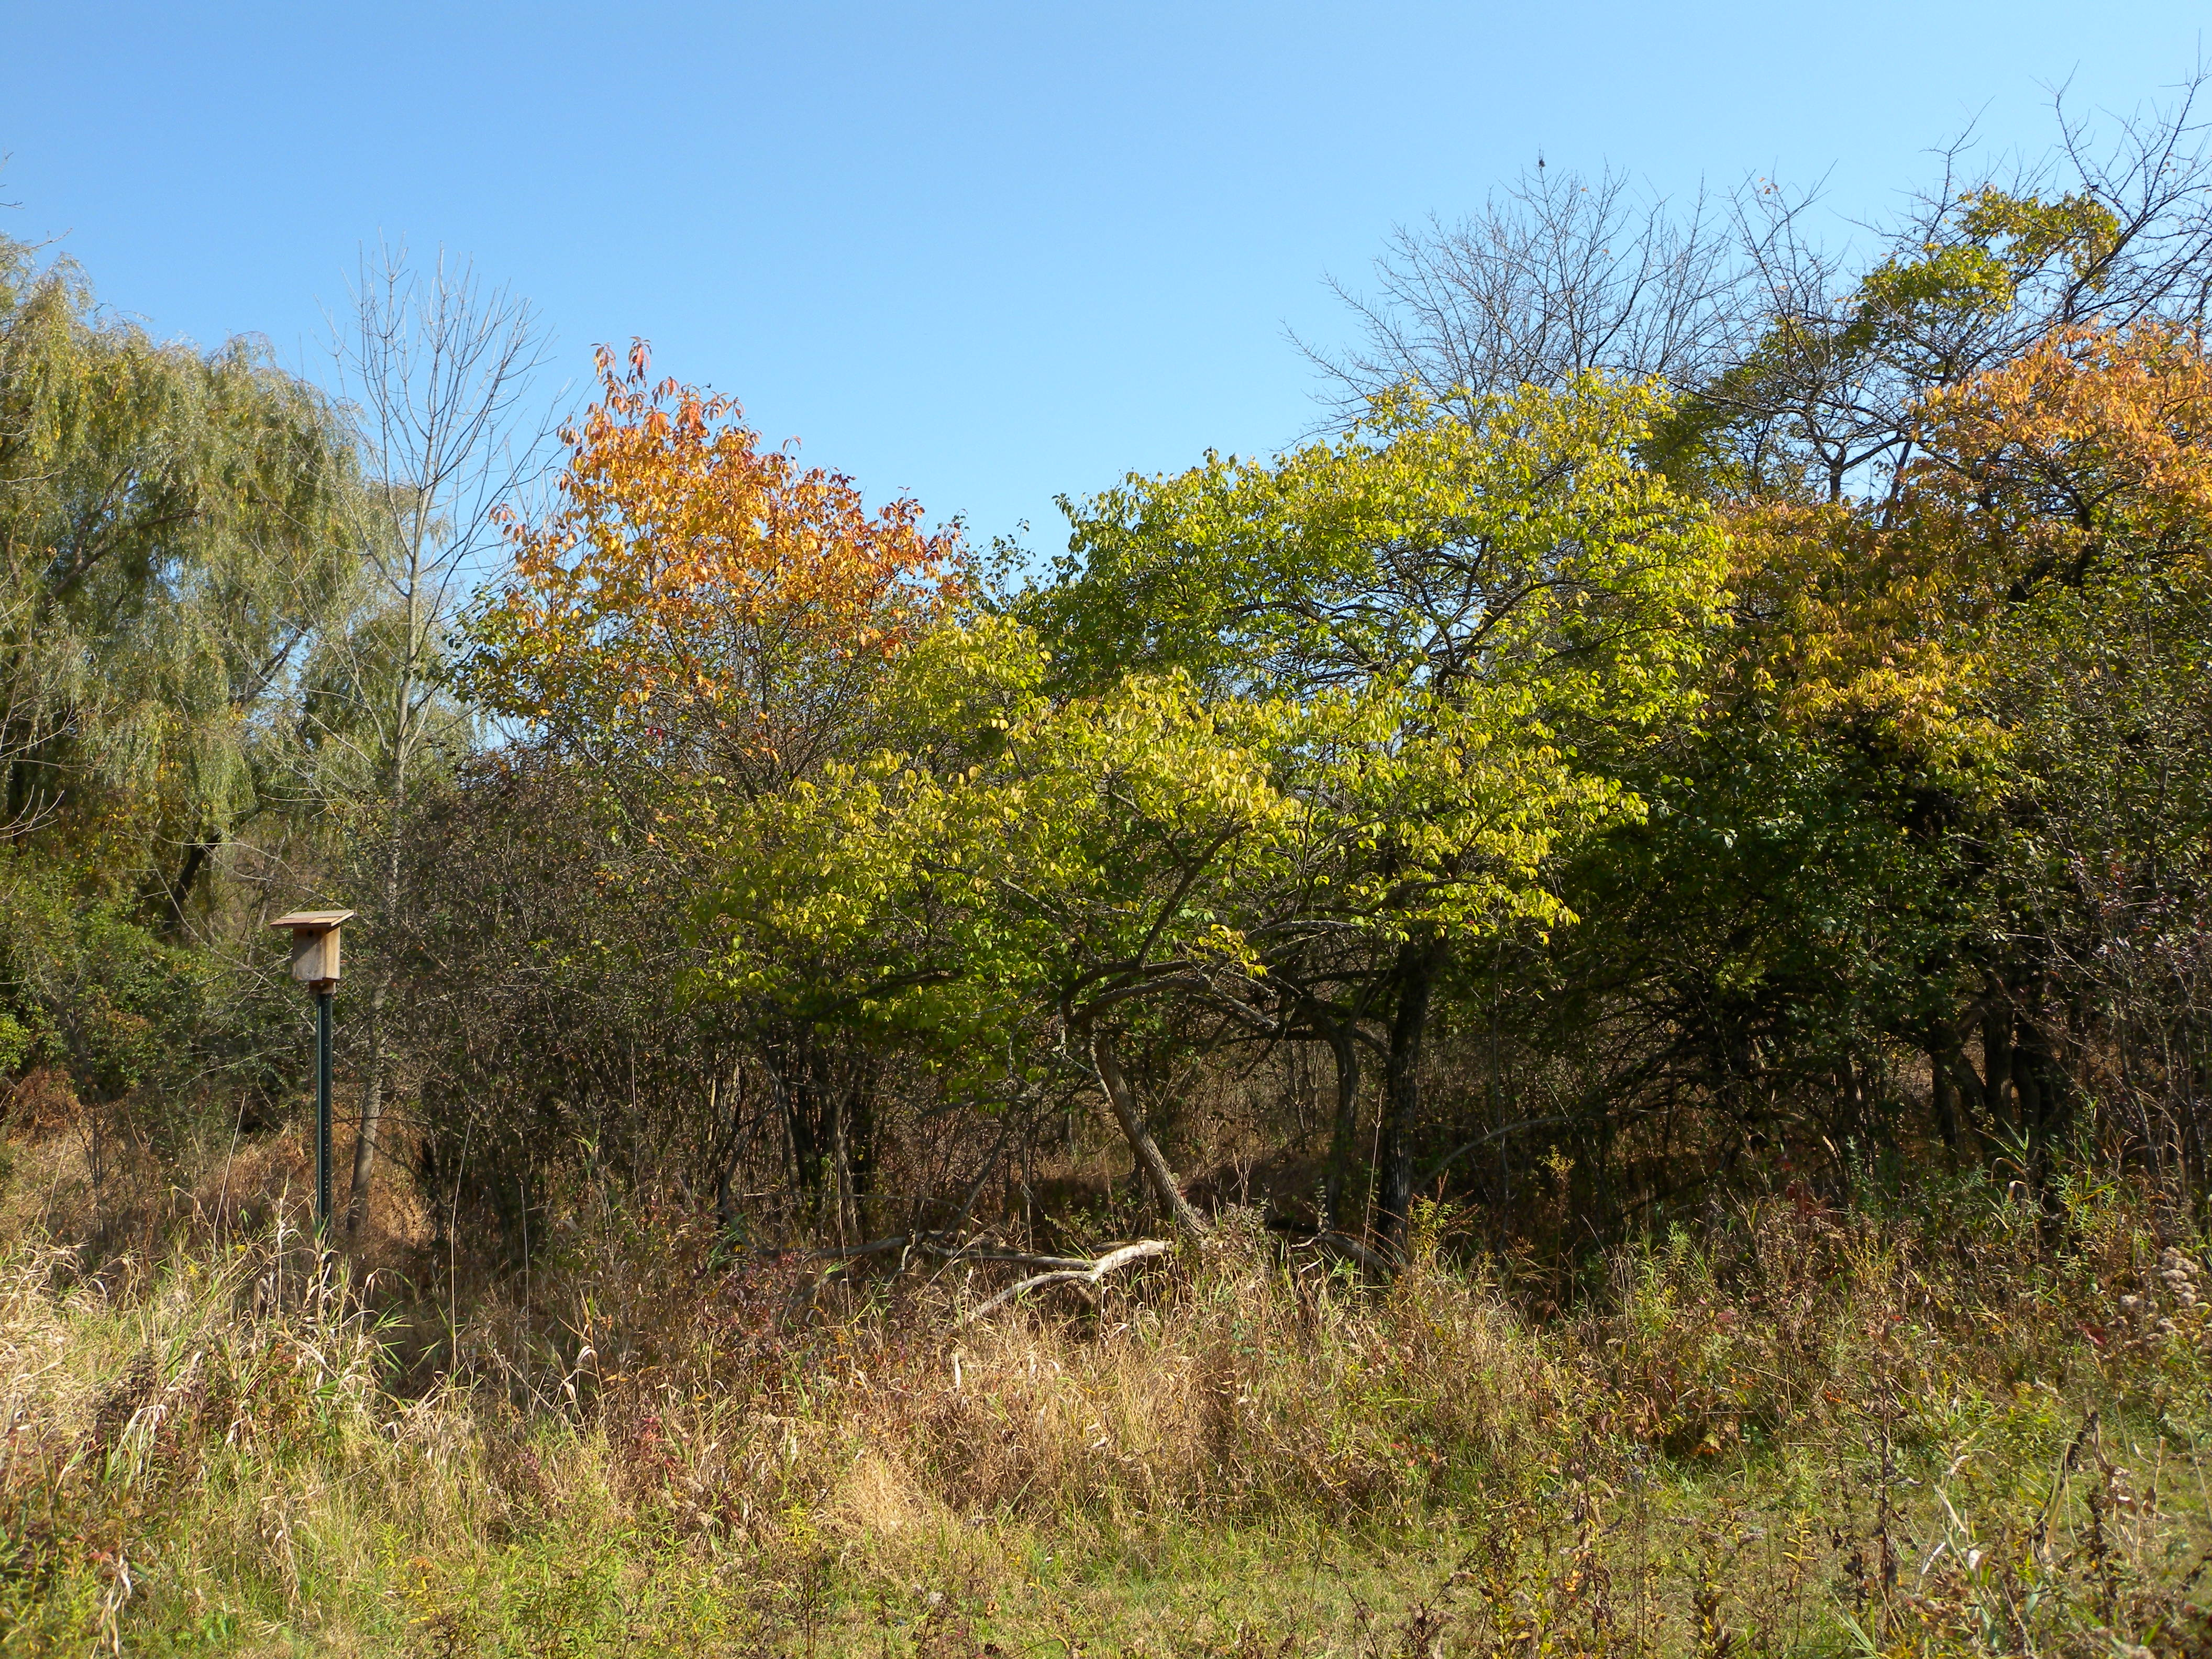 Early Successional Scrub Habitat at Ashbridge Preserve.